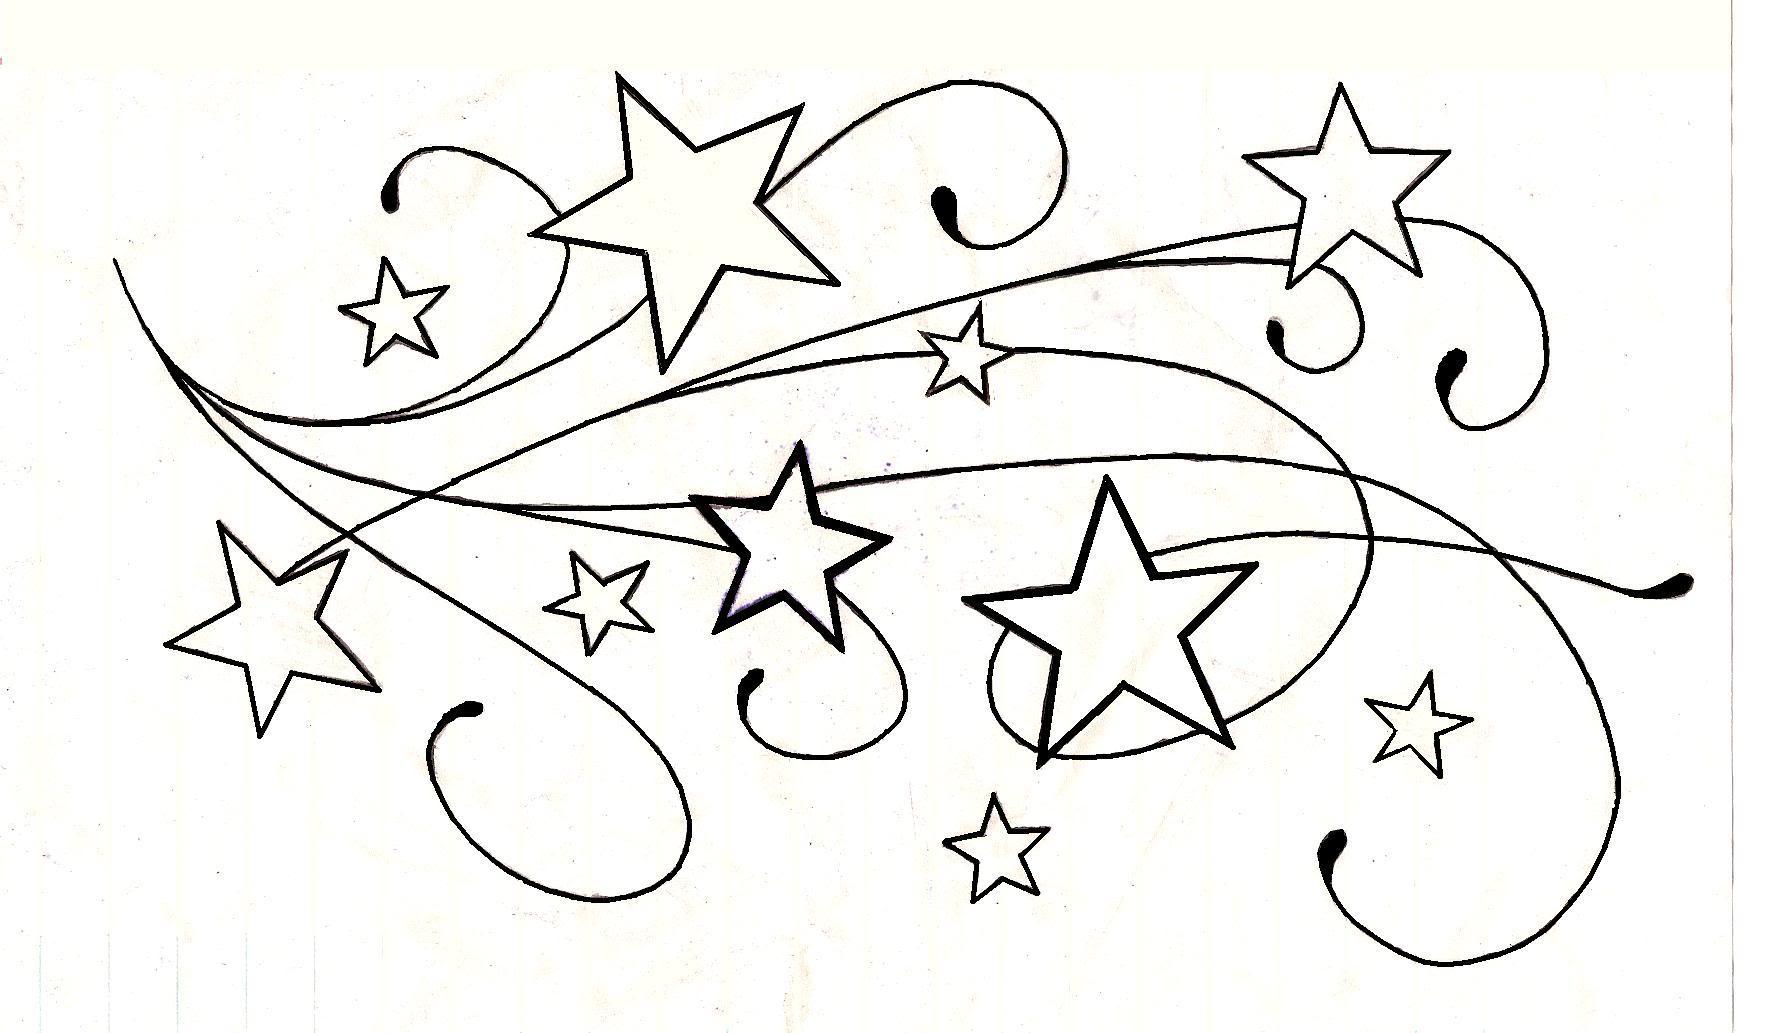 Небо звезды рисунок карандашом